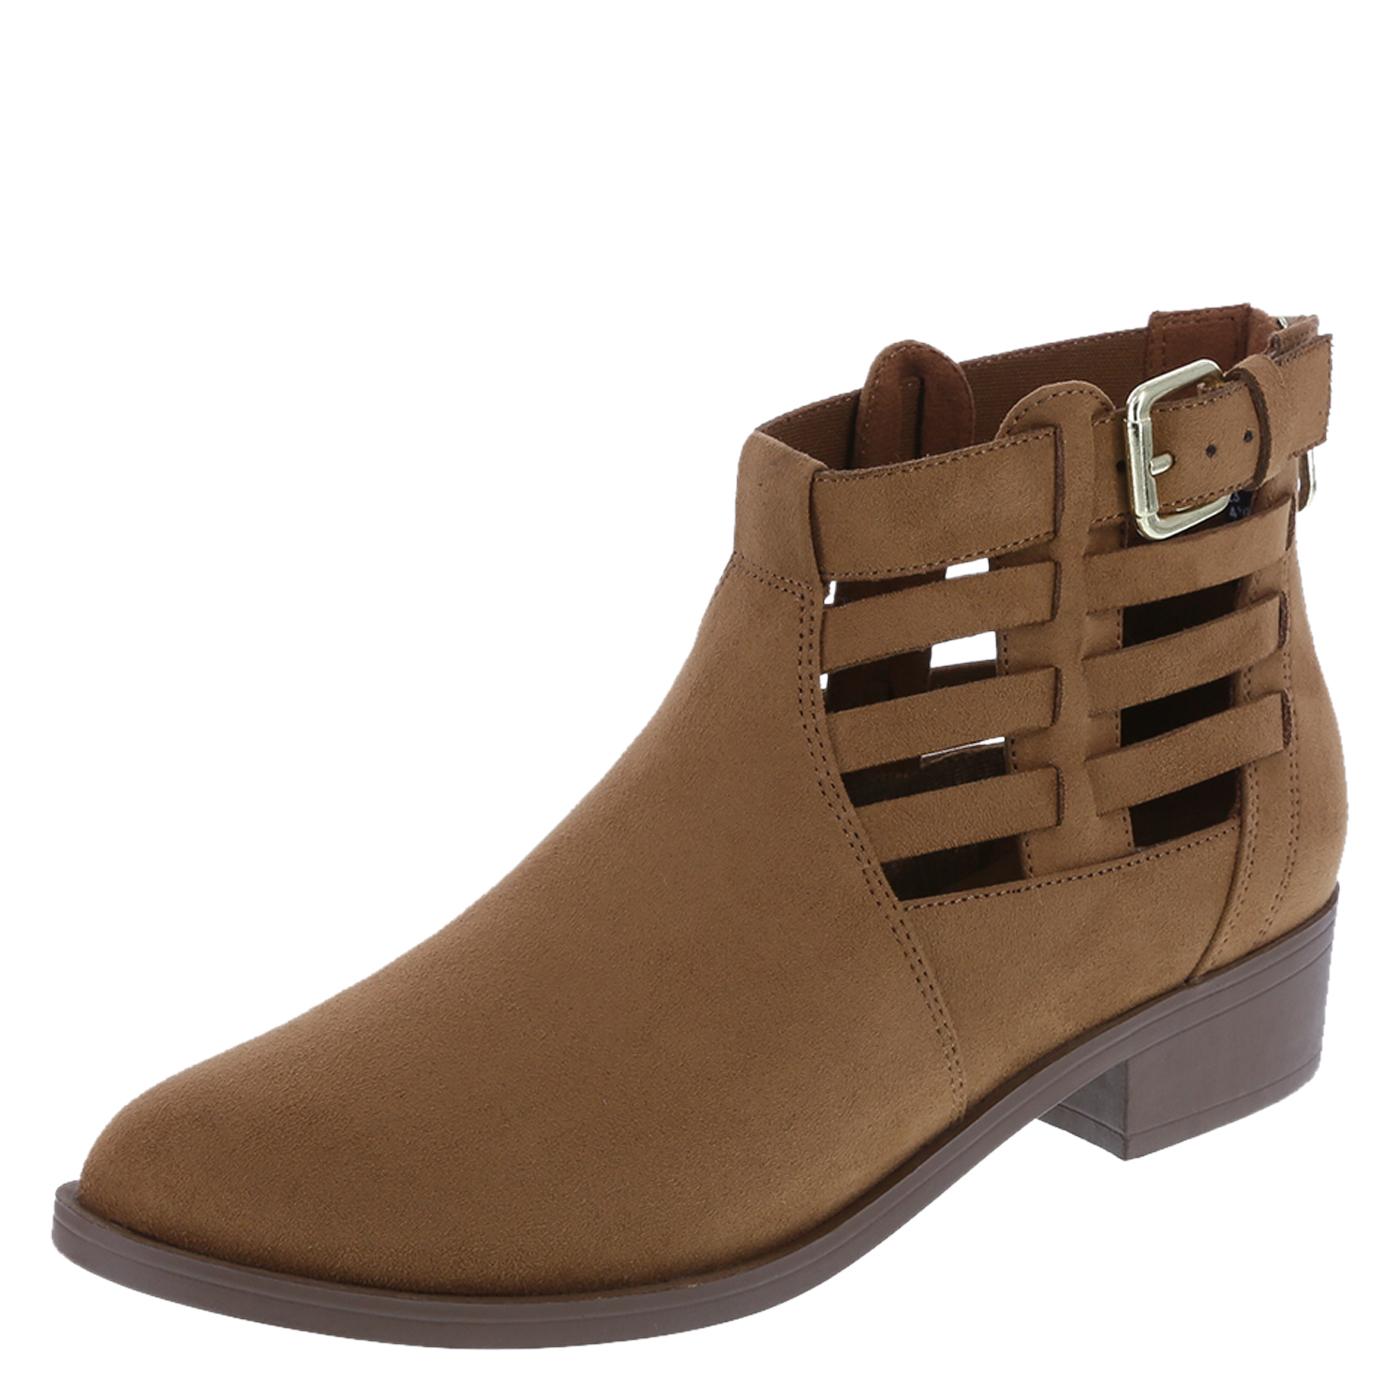 ankle boots for women womenu0027s slim cutout ankle boot, cognac suede, hi-res JWPDLIS